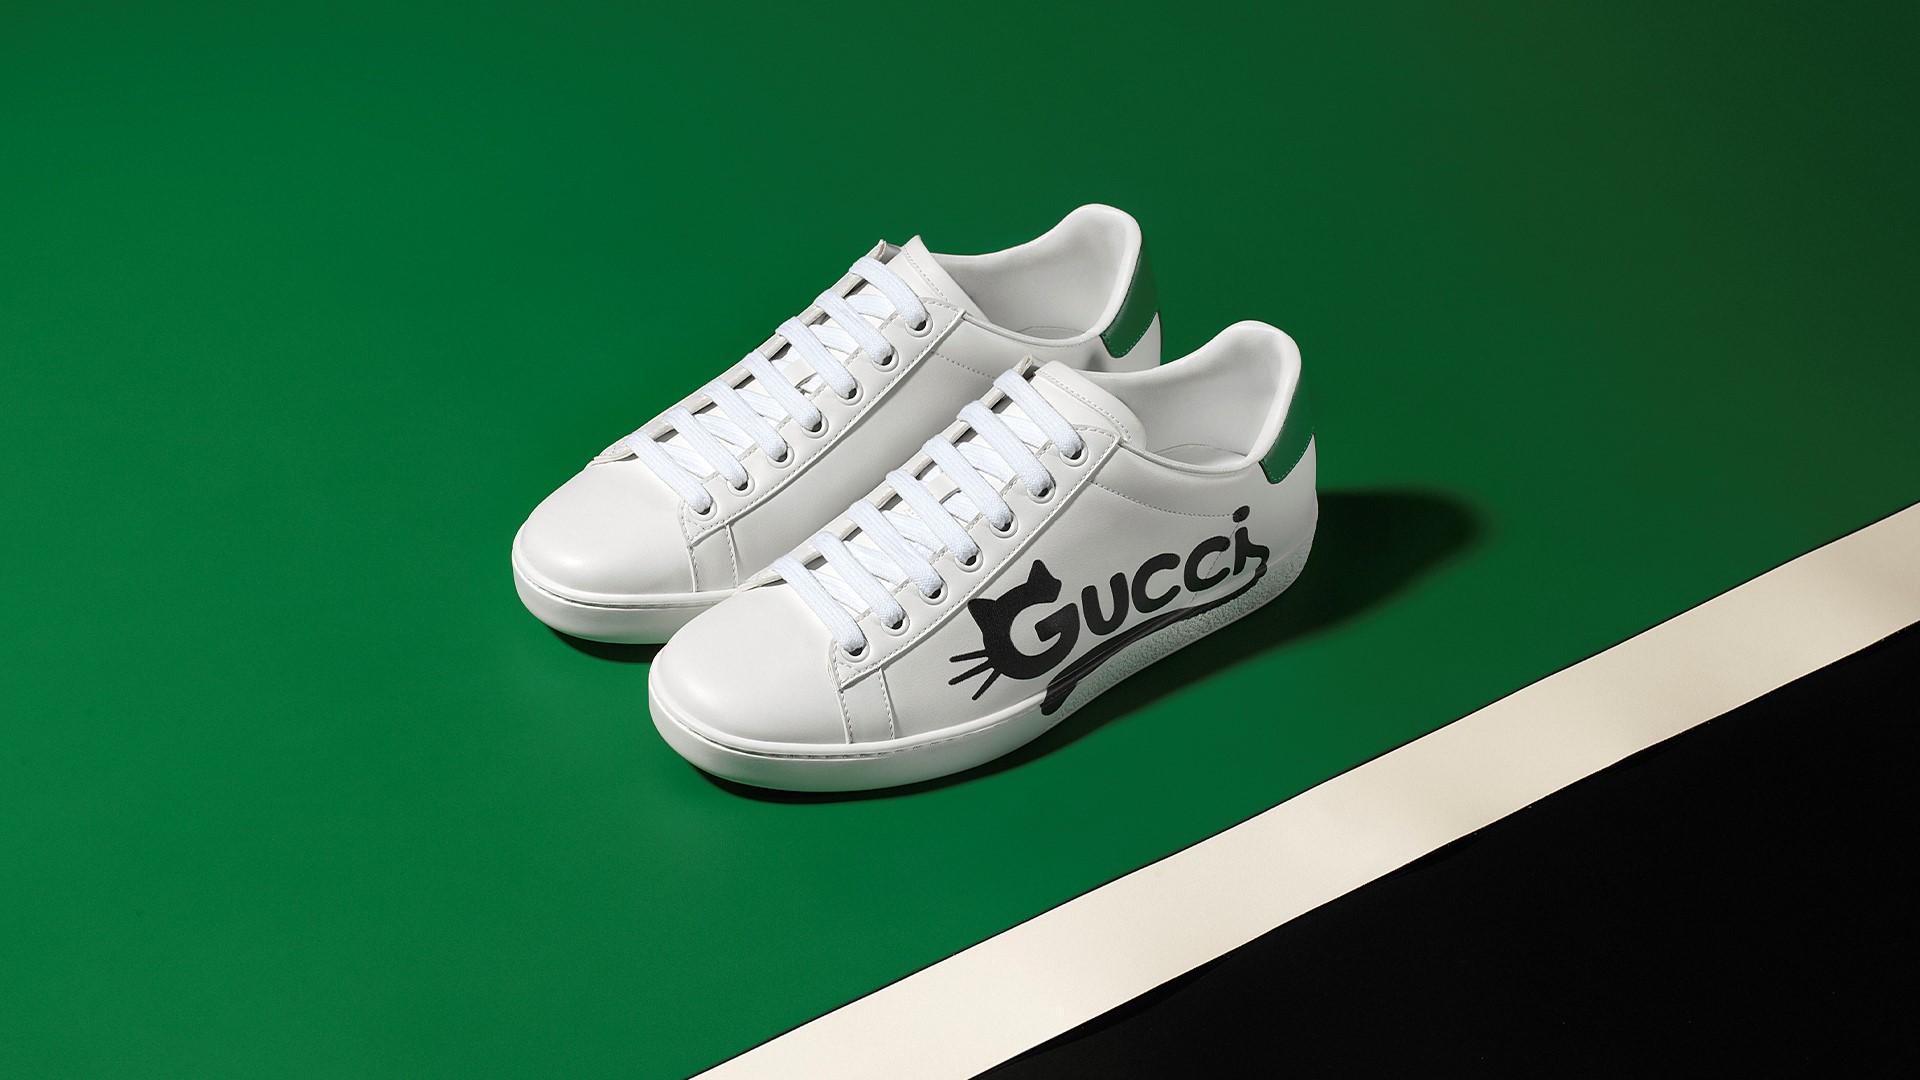 Ace Gucci Demetra